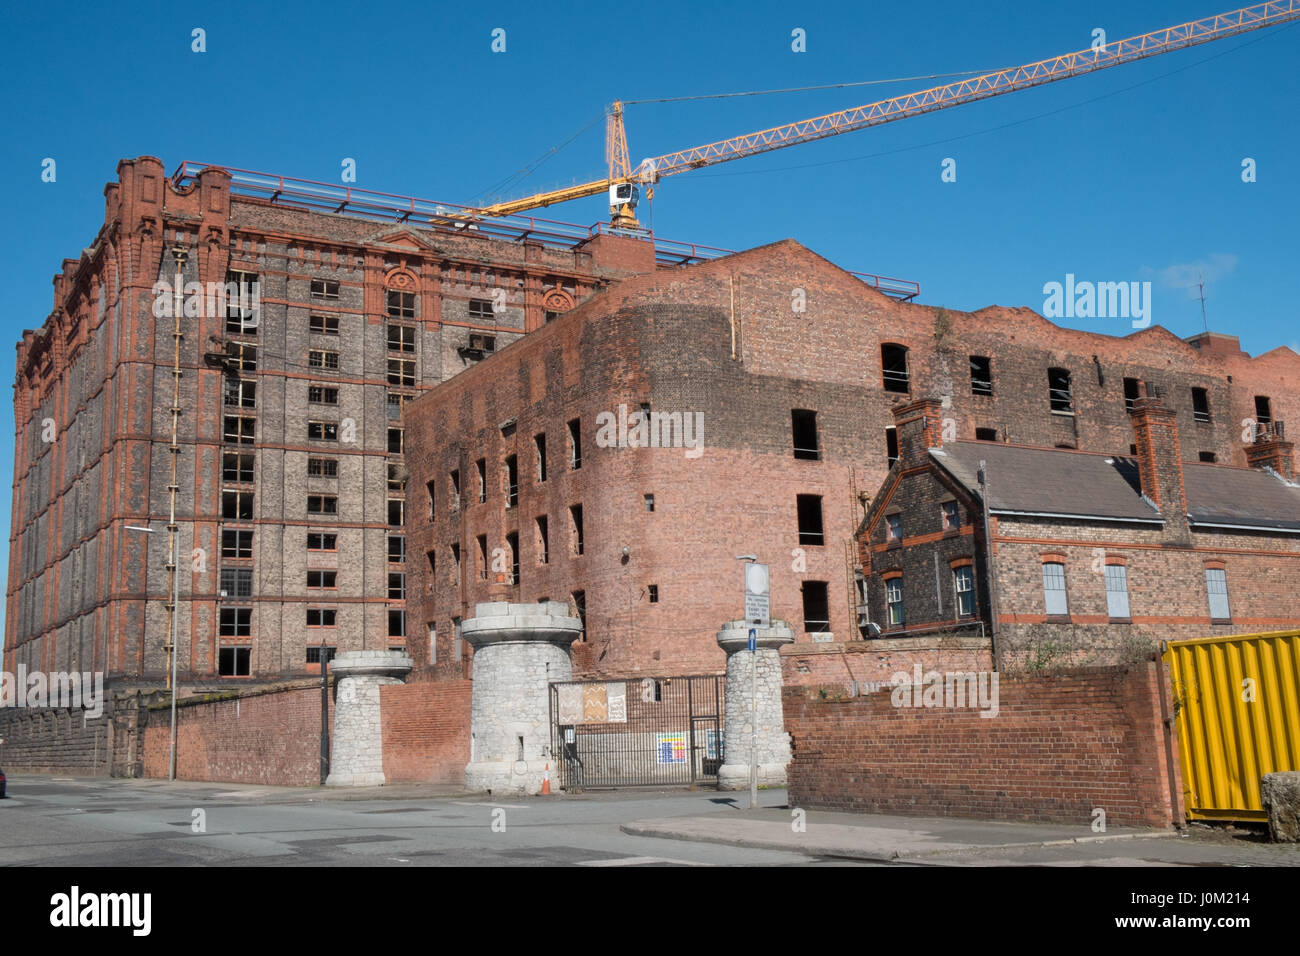 Stanley Dock,brick,warehouse,world's largest,brick,building,Liverpool,Merseyside,England,UNESCO,World Heritage City,City,North,England,English,UK. Stock Photo